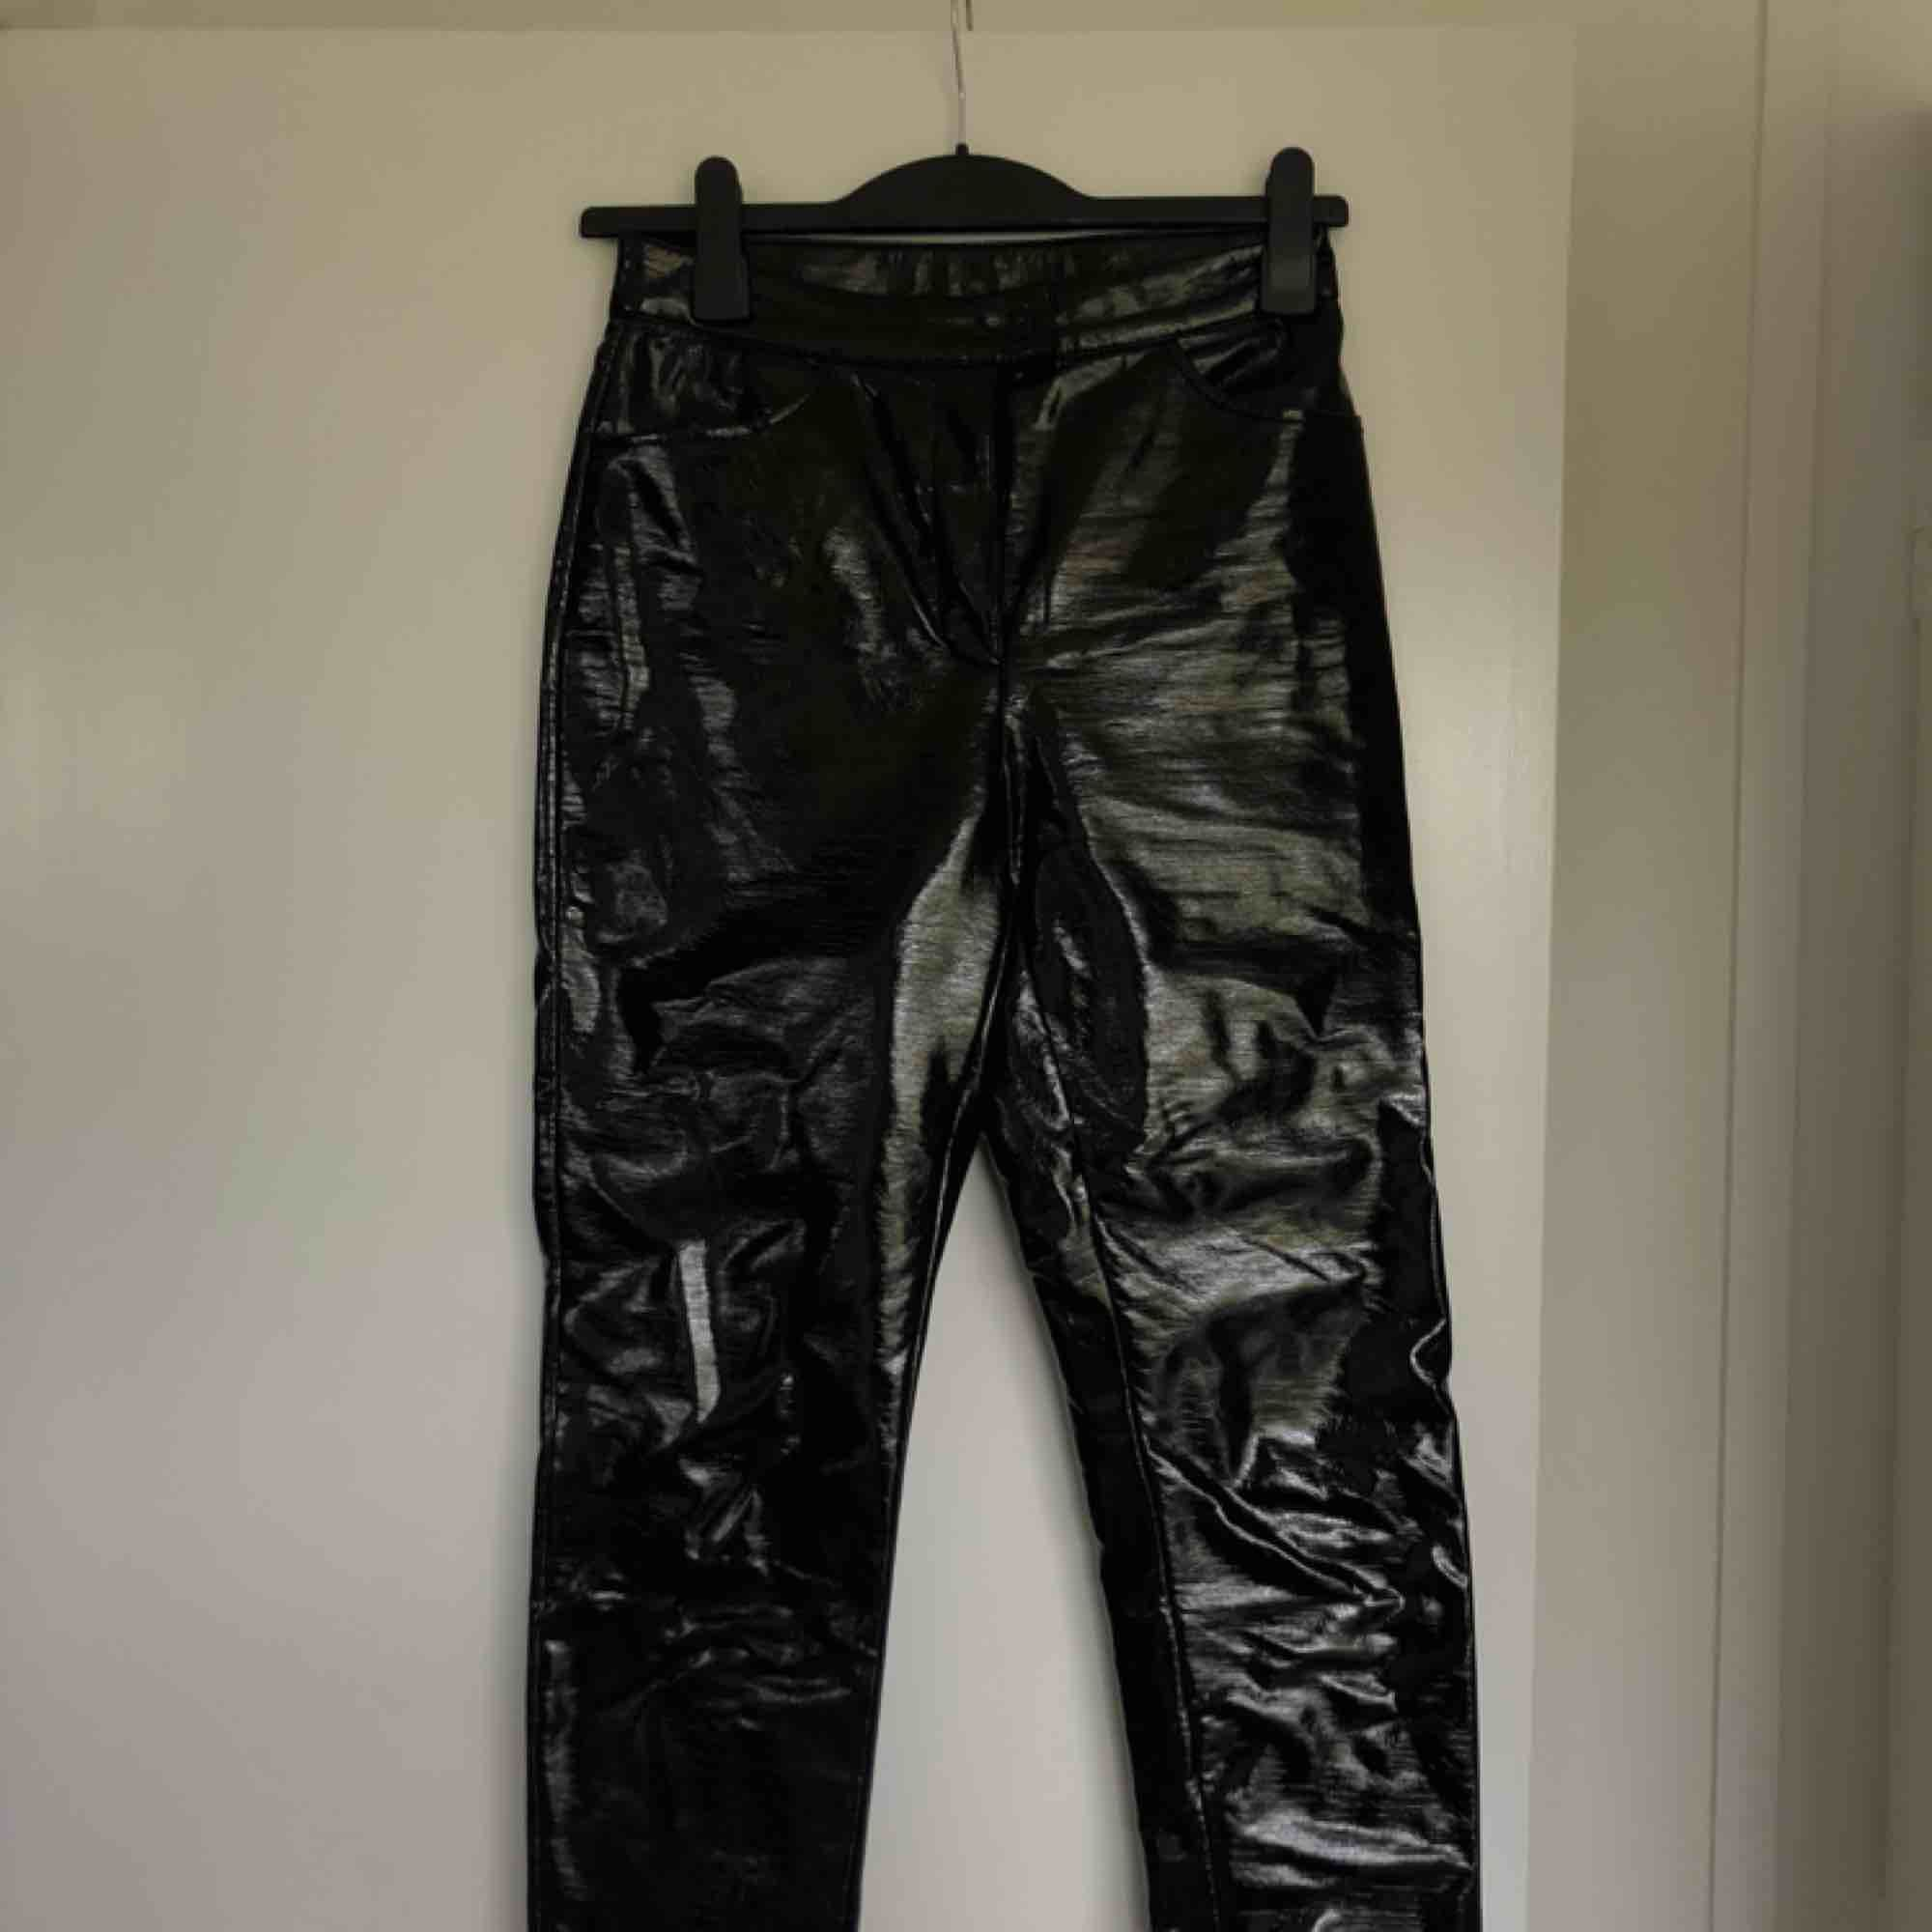 Coola latex byxor från monki. Jeans & Byxor.